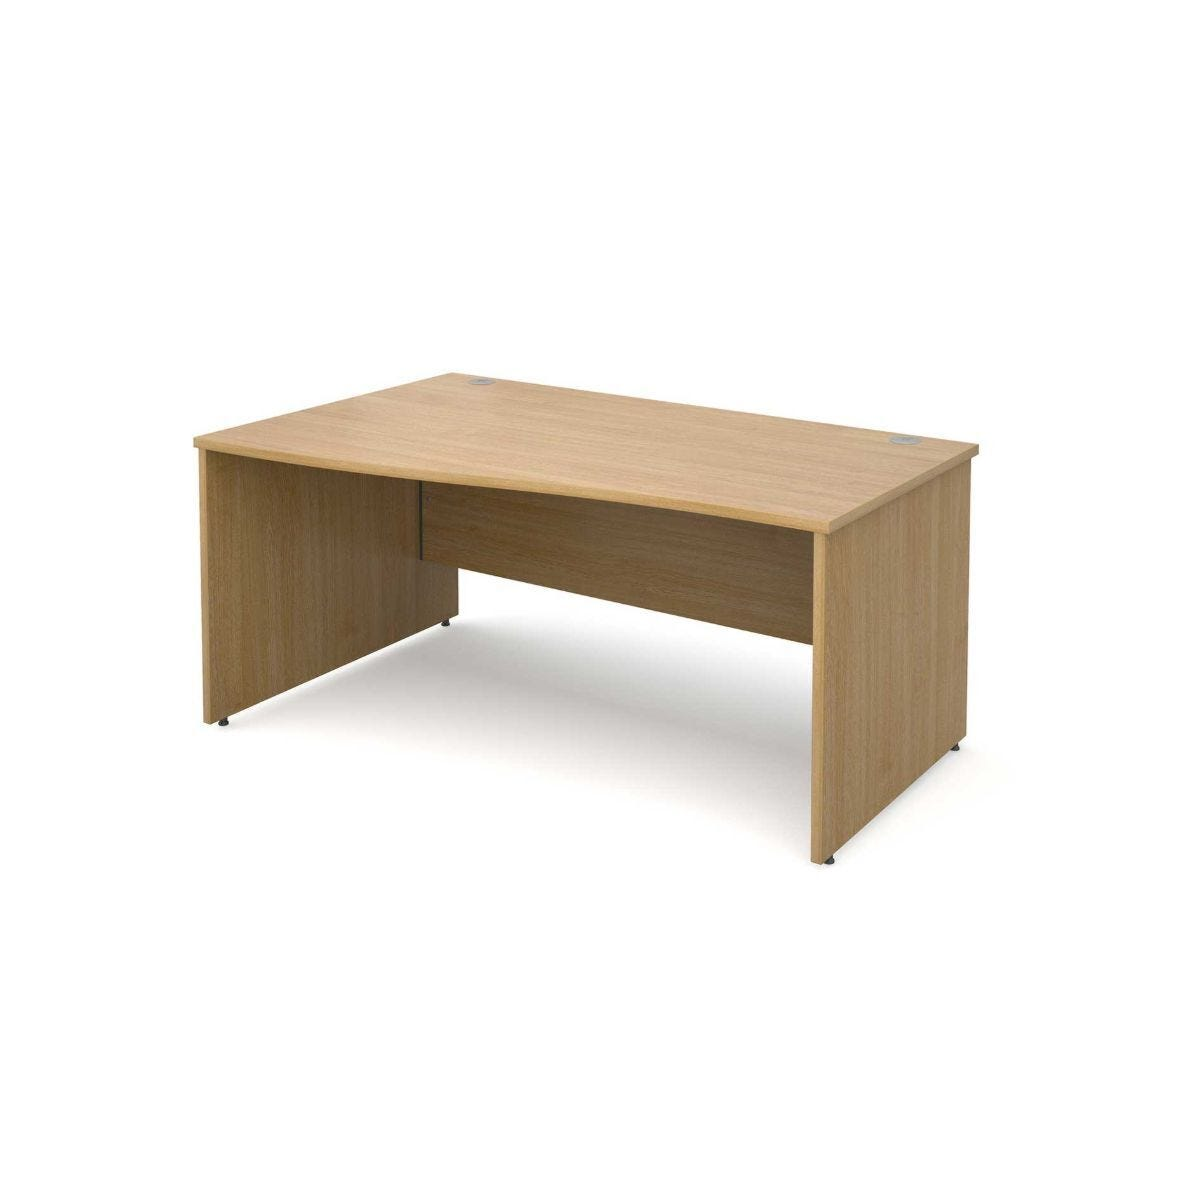 Maestro 25 Left Hand Wave 1600 Desk with End Panel Oak